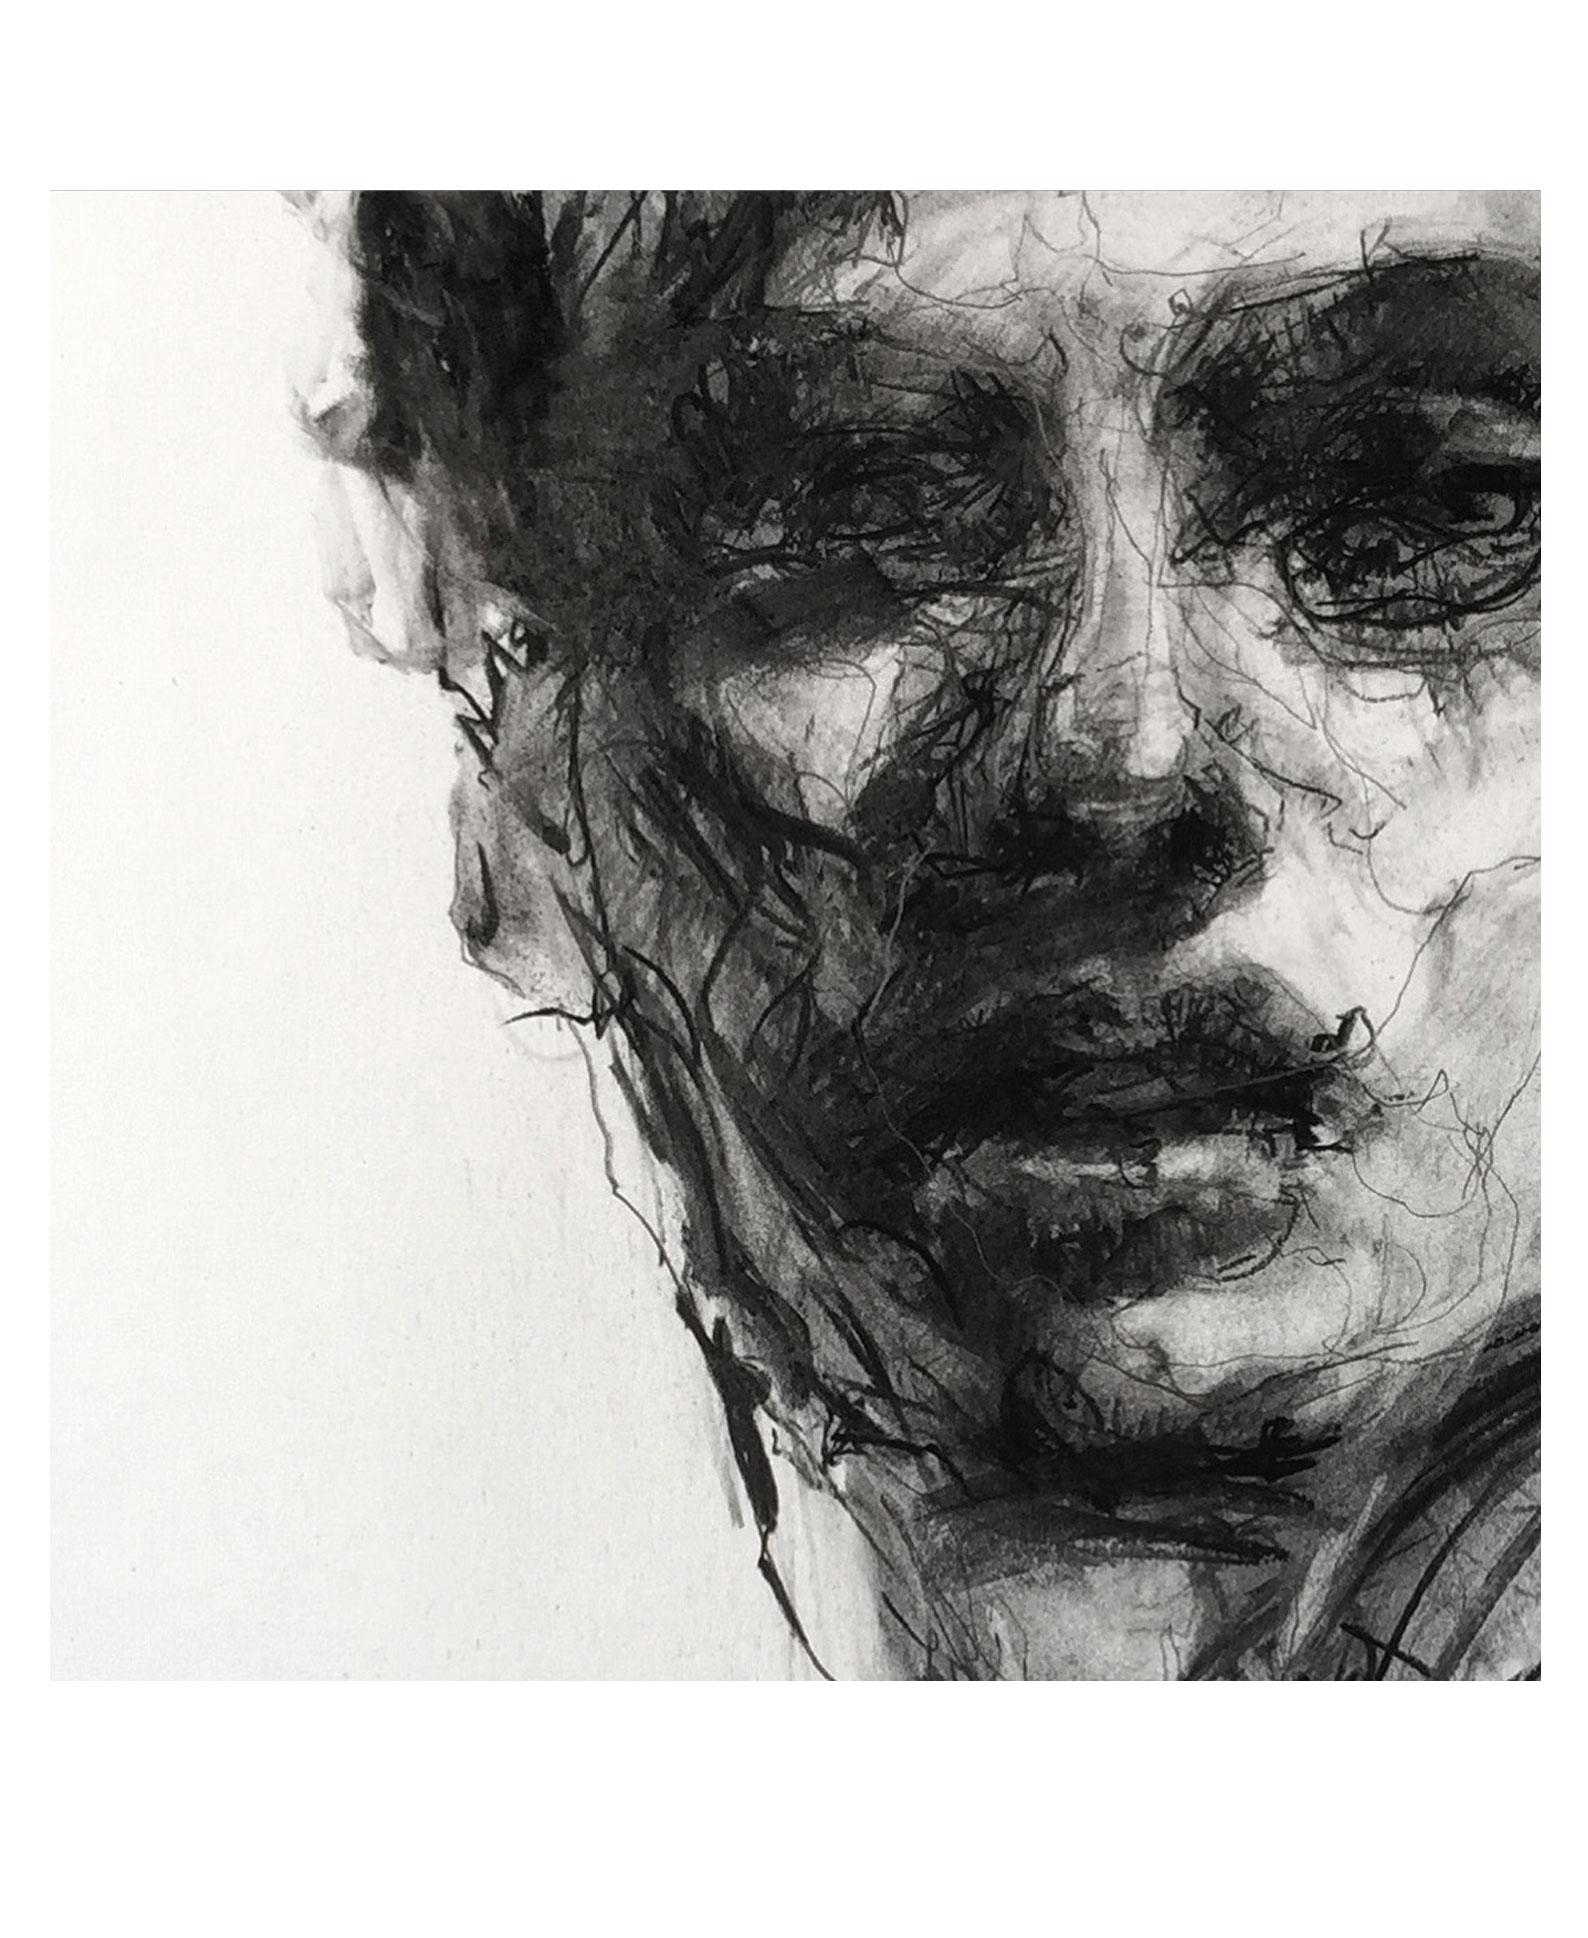 AgnesGrochulska.com_drawing_portrait_detail_2.jpg